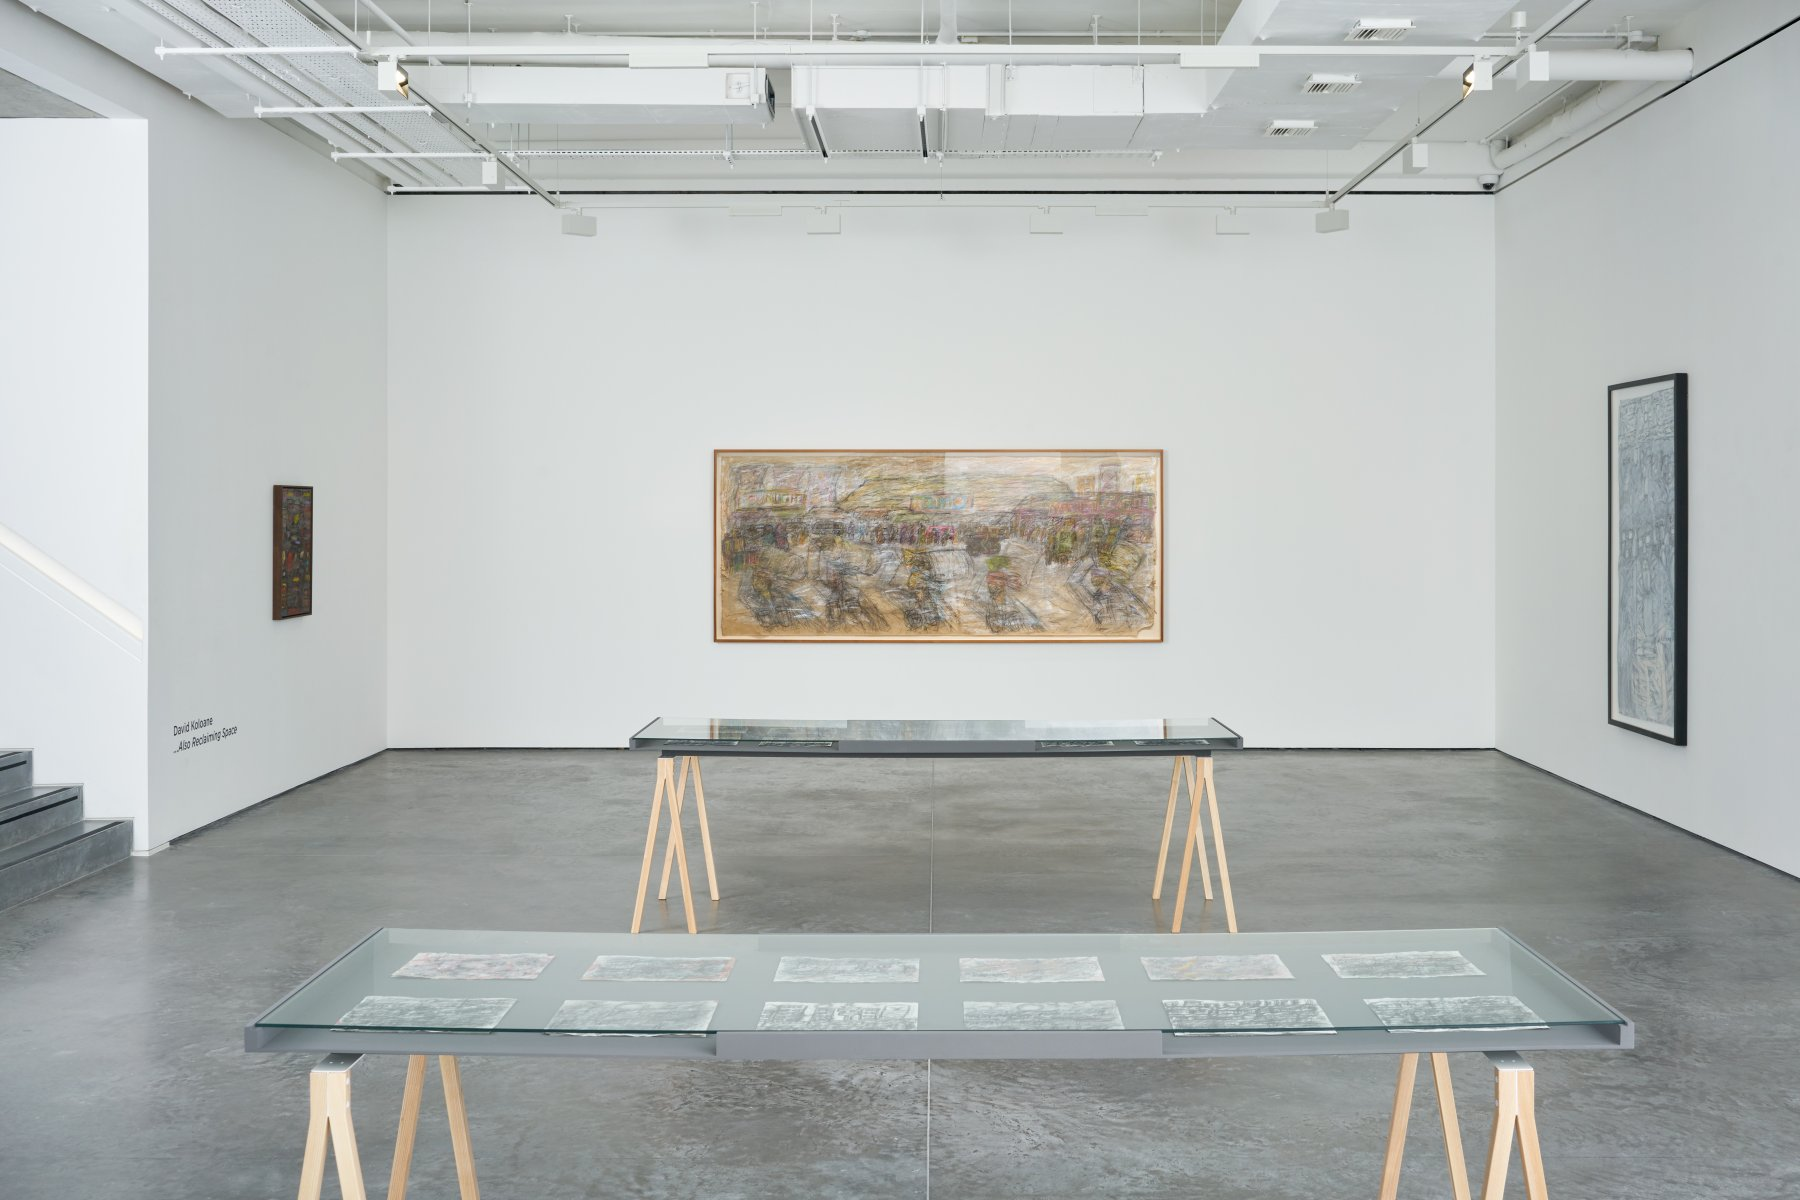 Goodman Gallery David Koloane 1